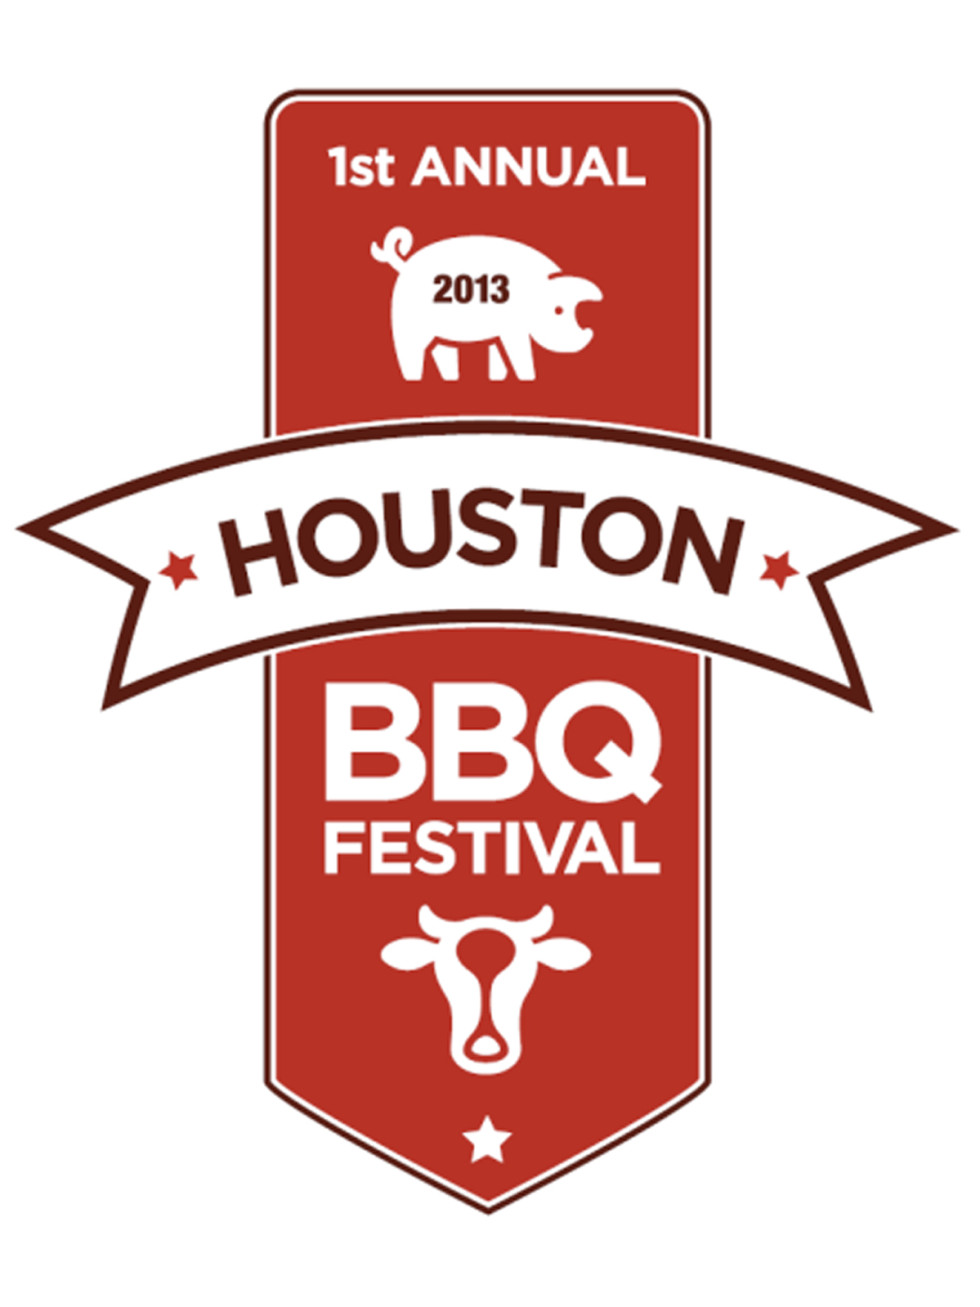 Houston Barbecue Festival, logo